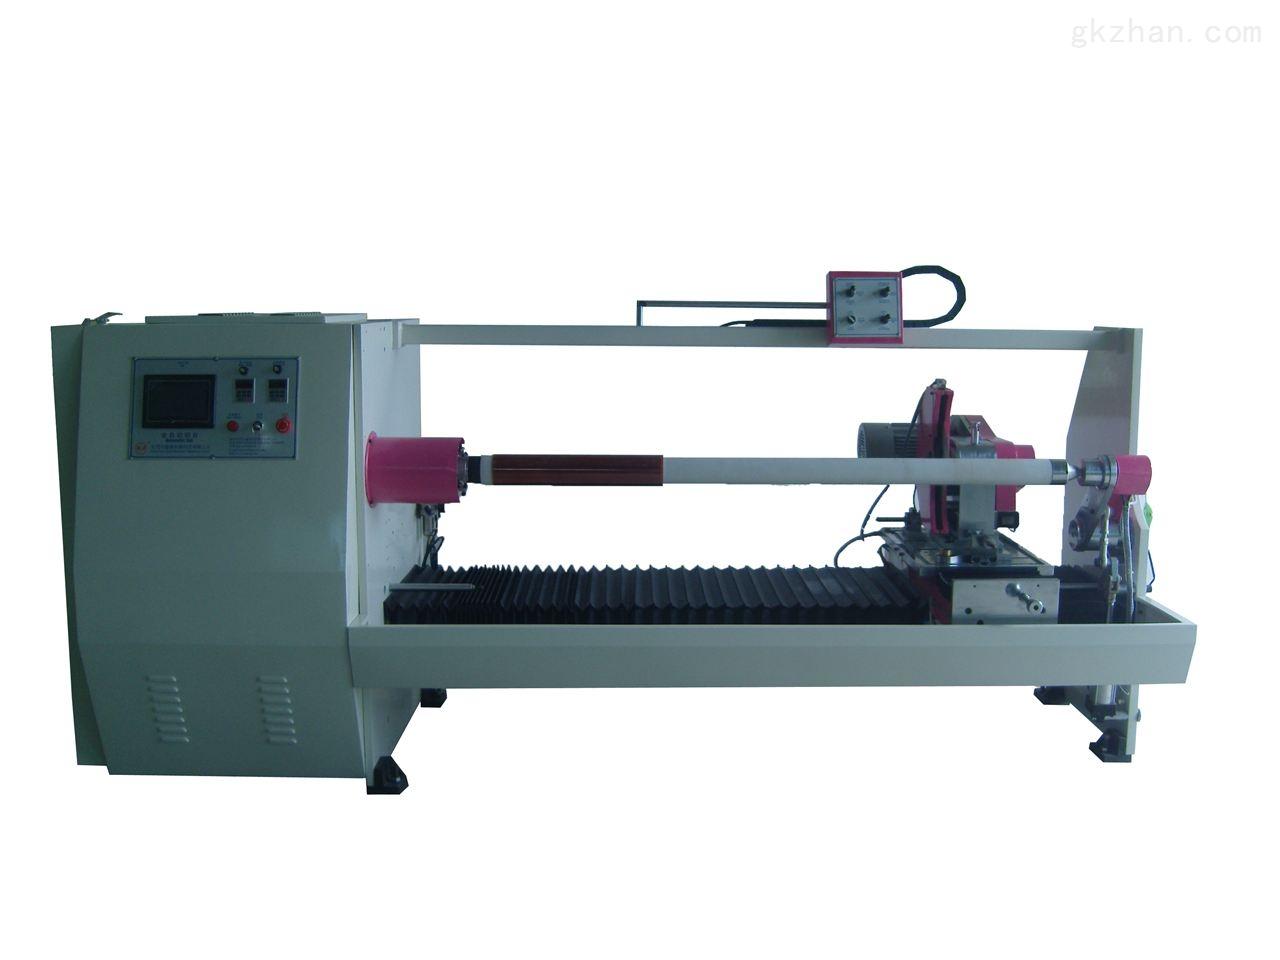 3M双面胶带自动切台 泡棉胶带分切机